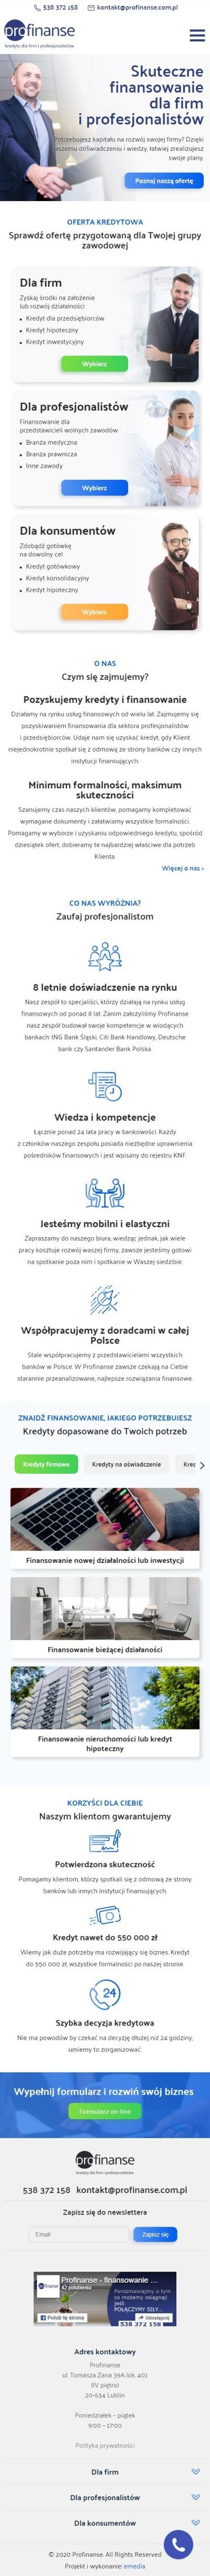 Strona internetowa profinanse.com.pl - zrzut mobile